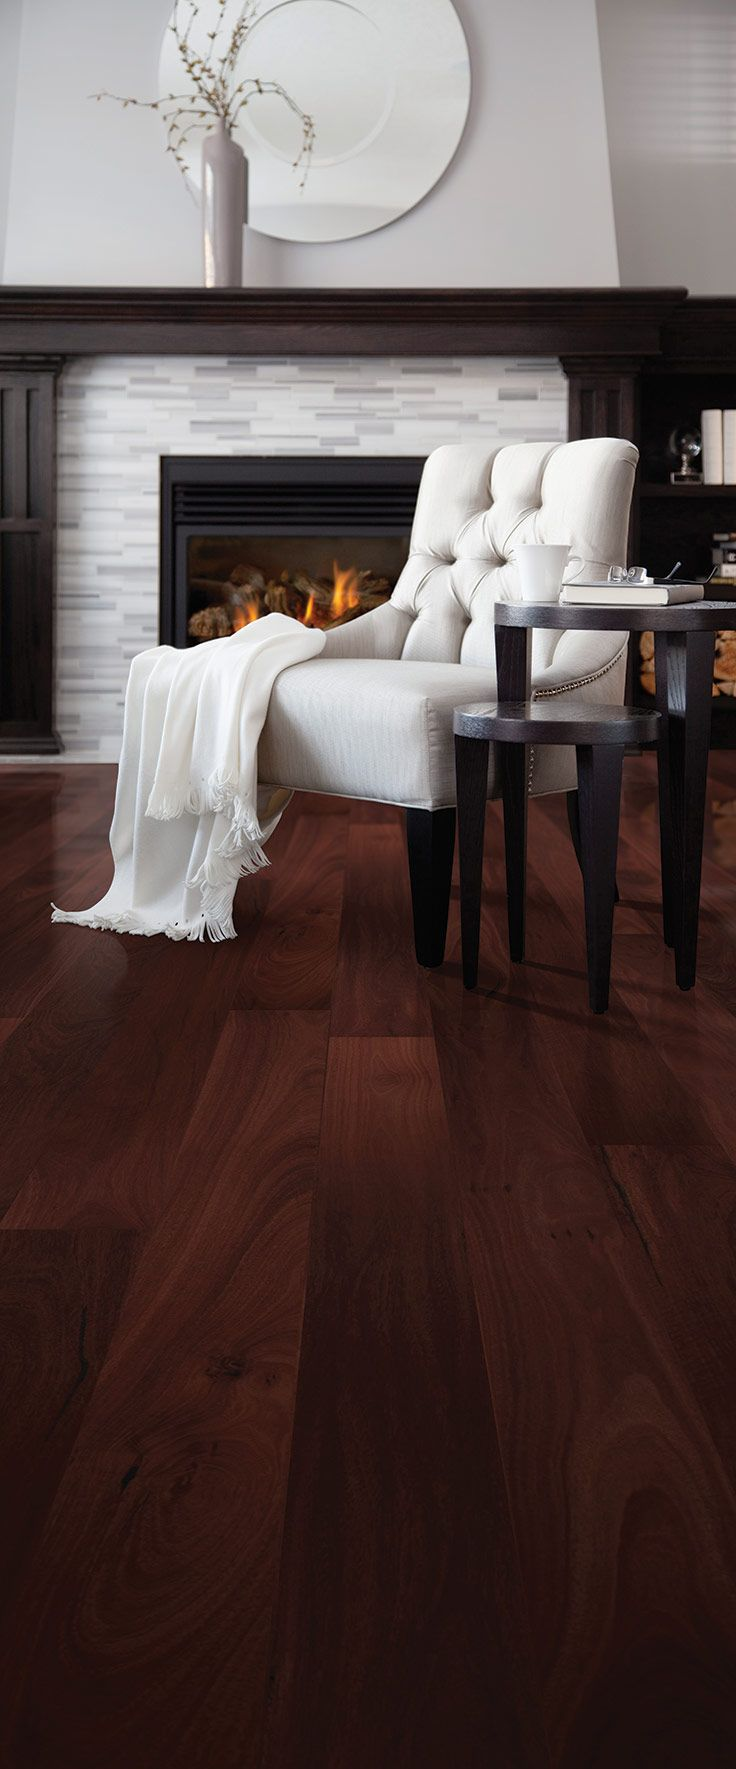 Godfrey Hirst | timber flooring | Get the look with Timber Naturals in Jarrah #godfreyhistflooring #godfreyhirst #flooring #jarrah #timber #interiors #homedecor